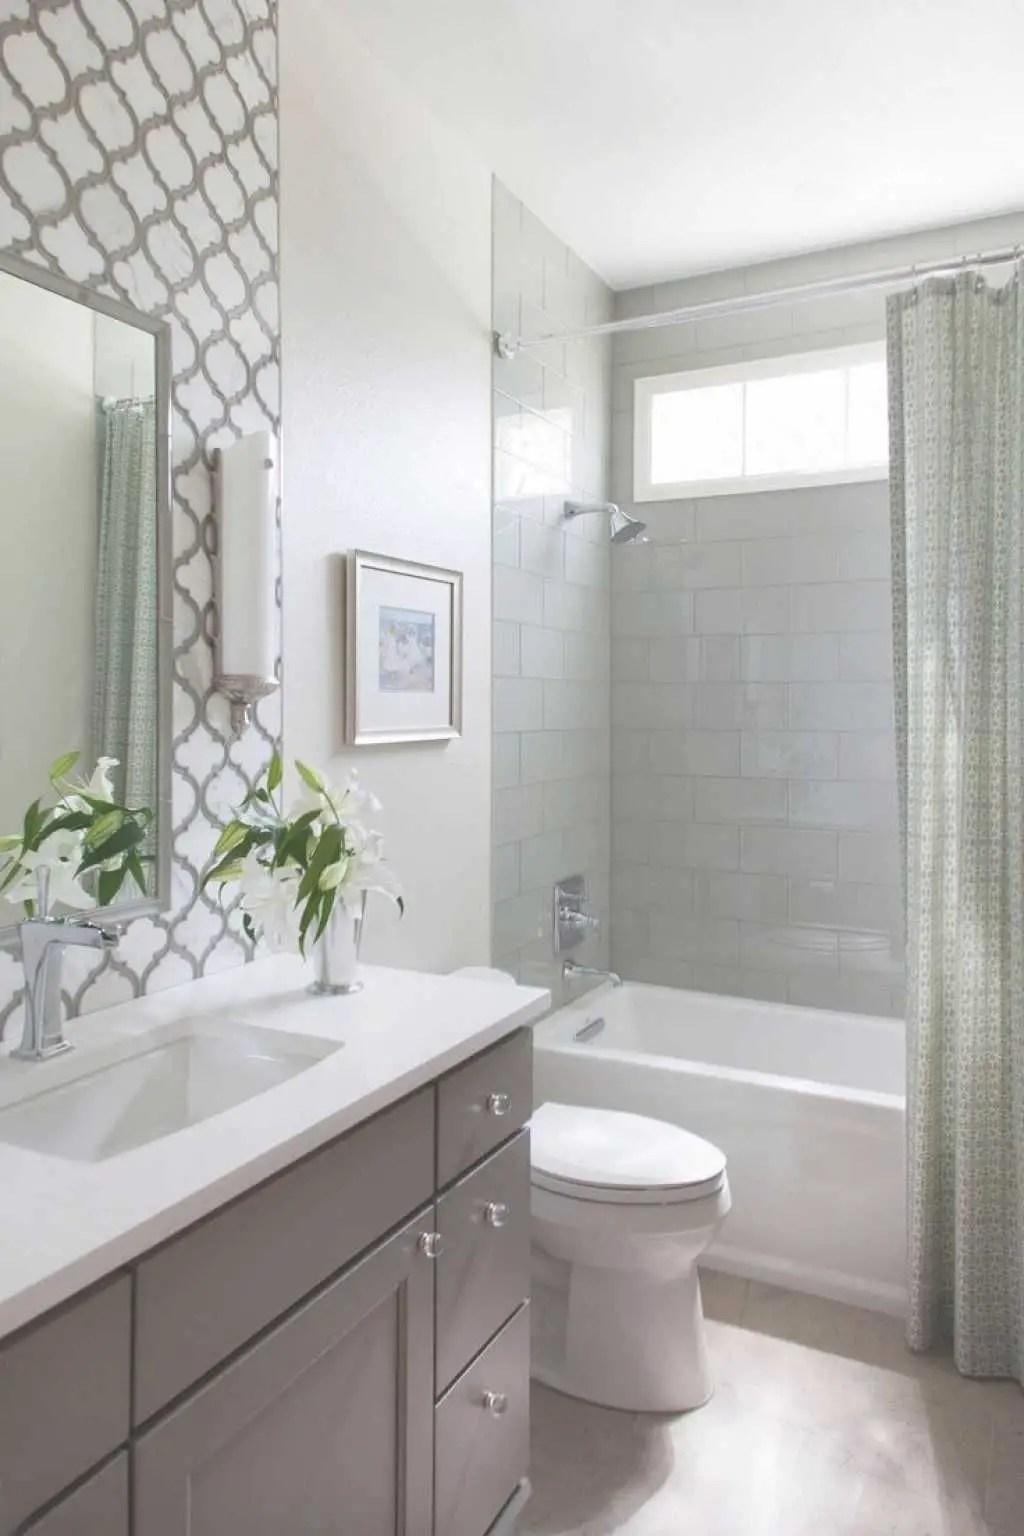 10 Ideas About Tub Shower Combo On | Bathroom Tub Regarding Small Bathroom Tub Shower Combo Remodeling Ideas